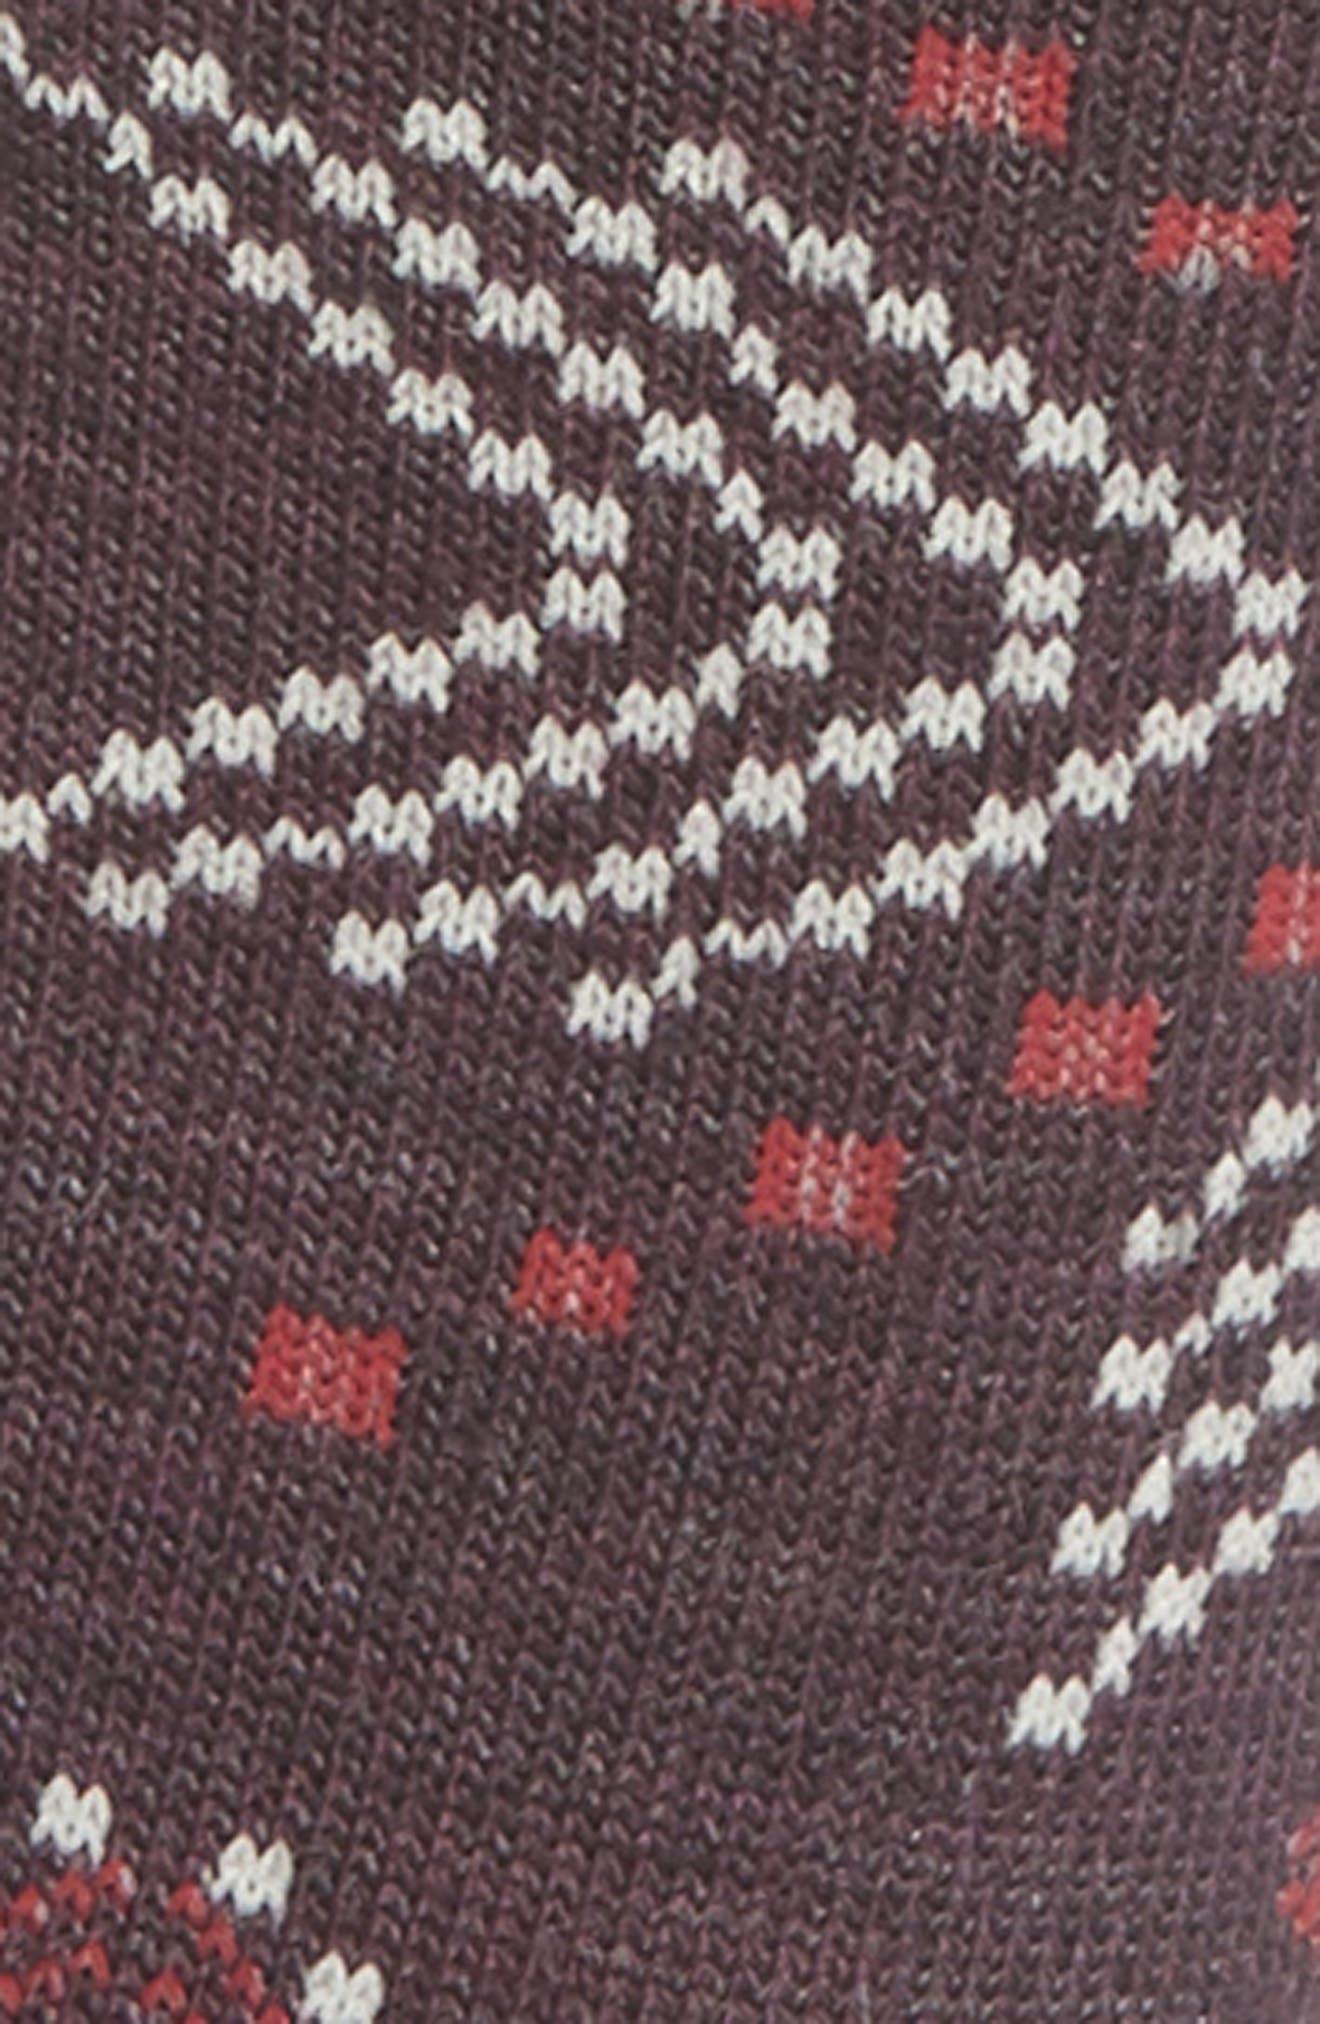 Dasher Crew Socks,                             Alternate thumbnail 2, color,                             BORDEAUX HEATHER